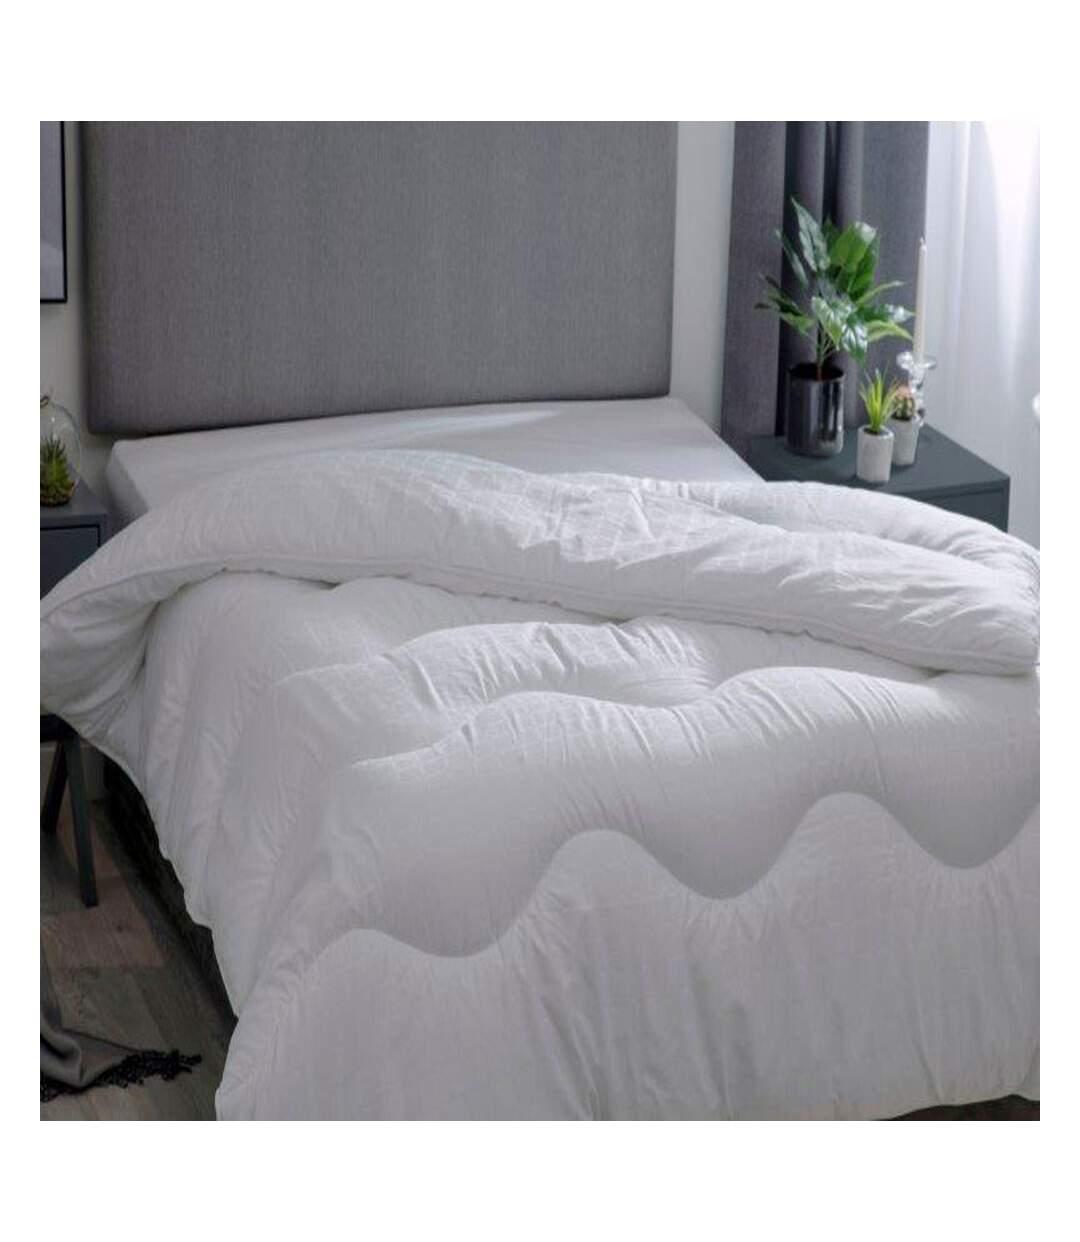 Belledorm - Couette Hotel Suite 4.5 Tog (Blanc) - UTBM205